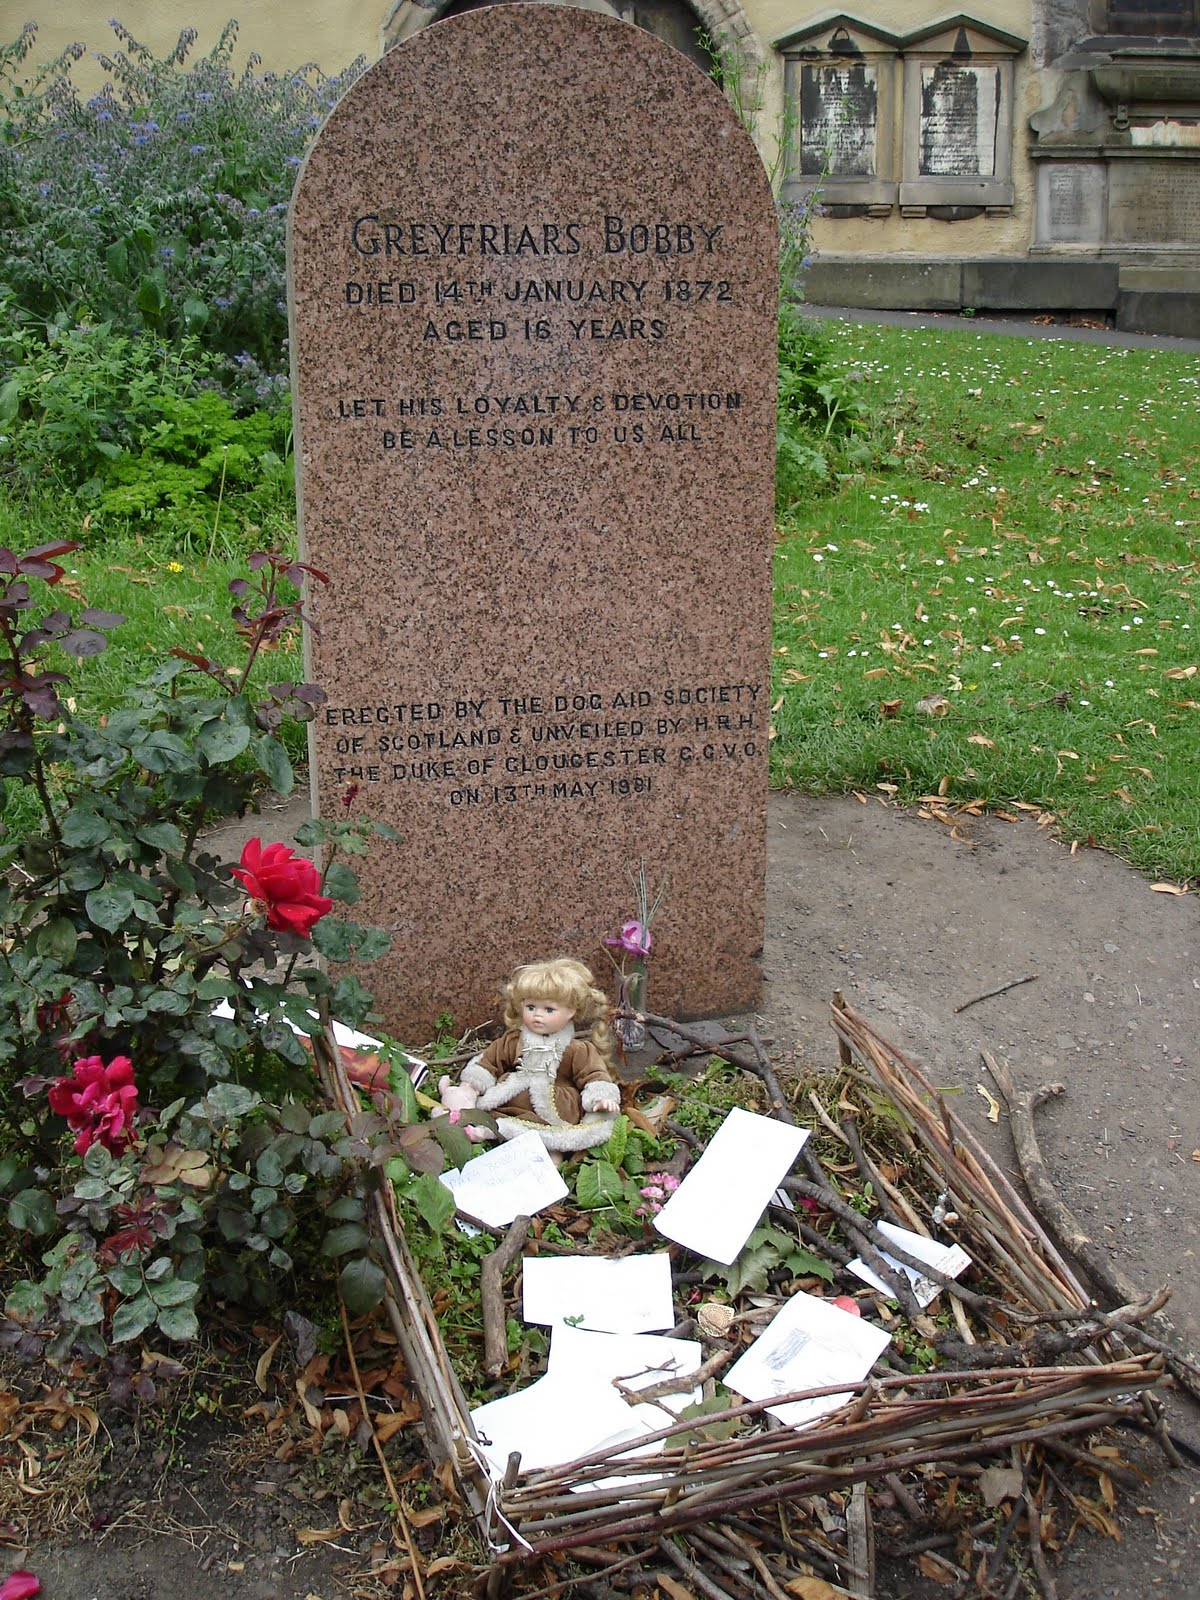 Where is Matron buried 14